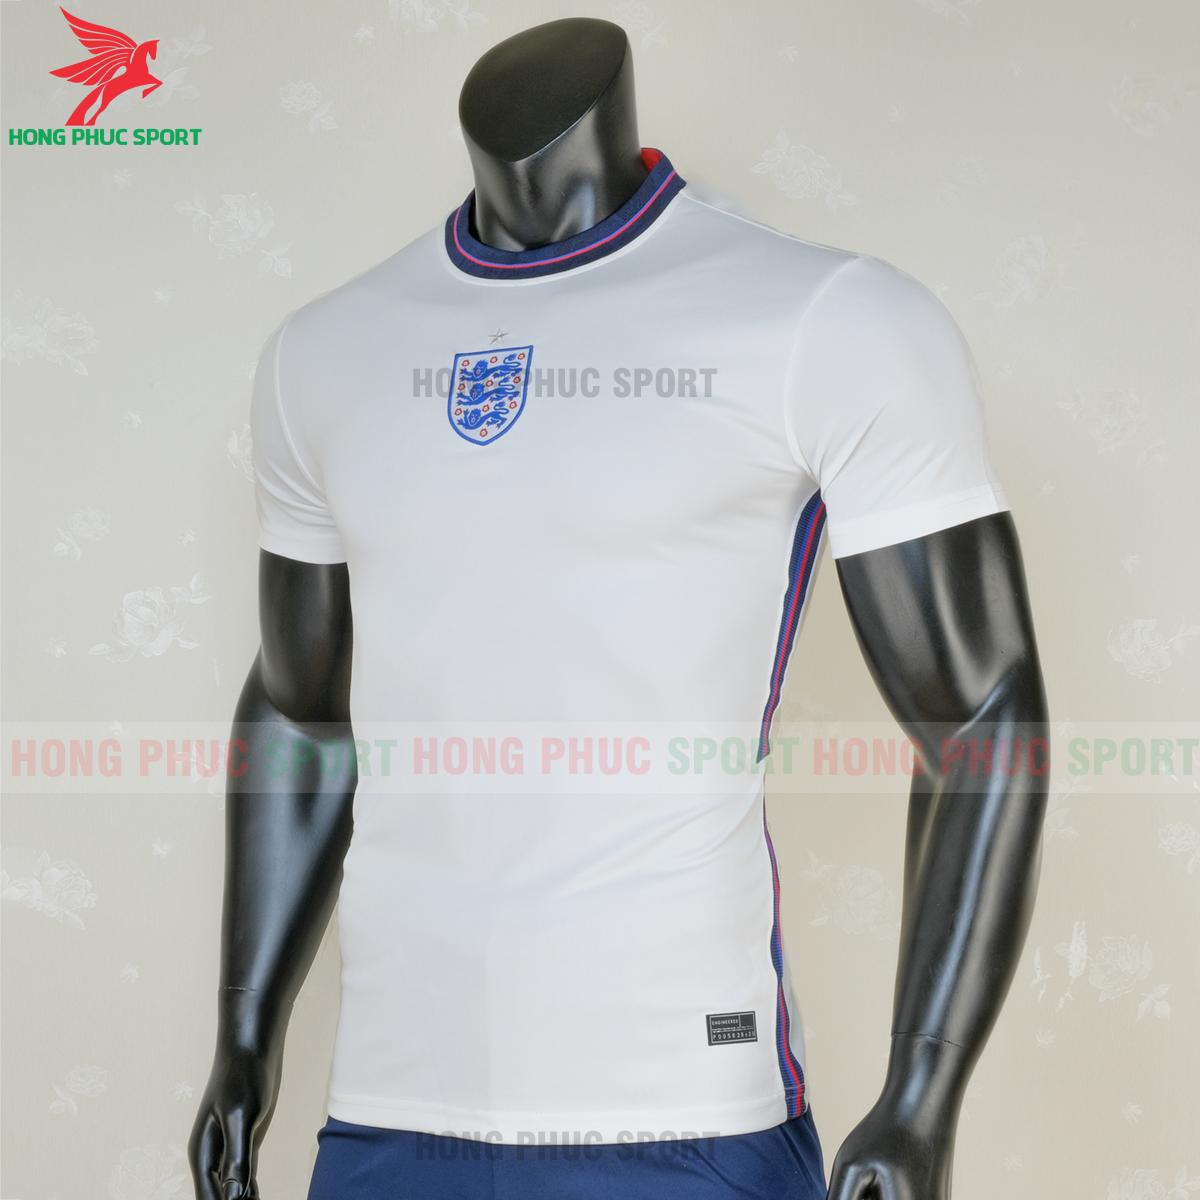 https://cdn.hongphucsport.com/unsafe/s4.shopbay.vn/files/285/ao-tuyen-anh-tl-4-5f6dc87e5d345.png